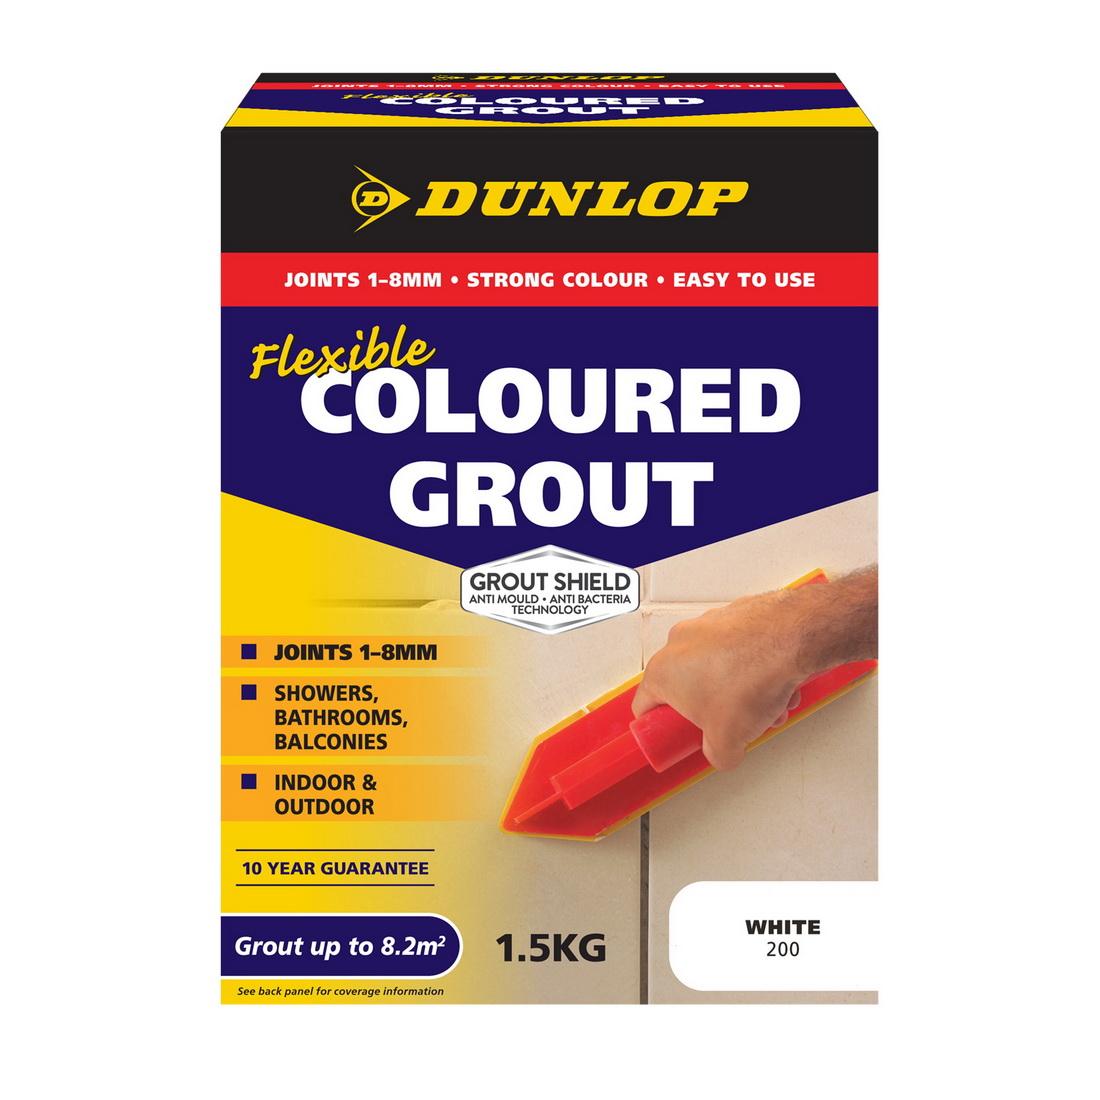 Flexible Coloured Grout Misty Grey 1.5kg 10321